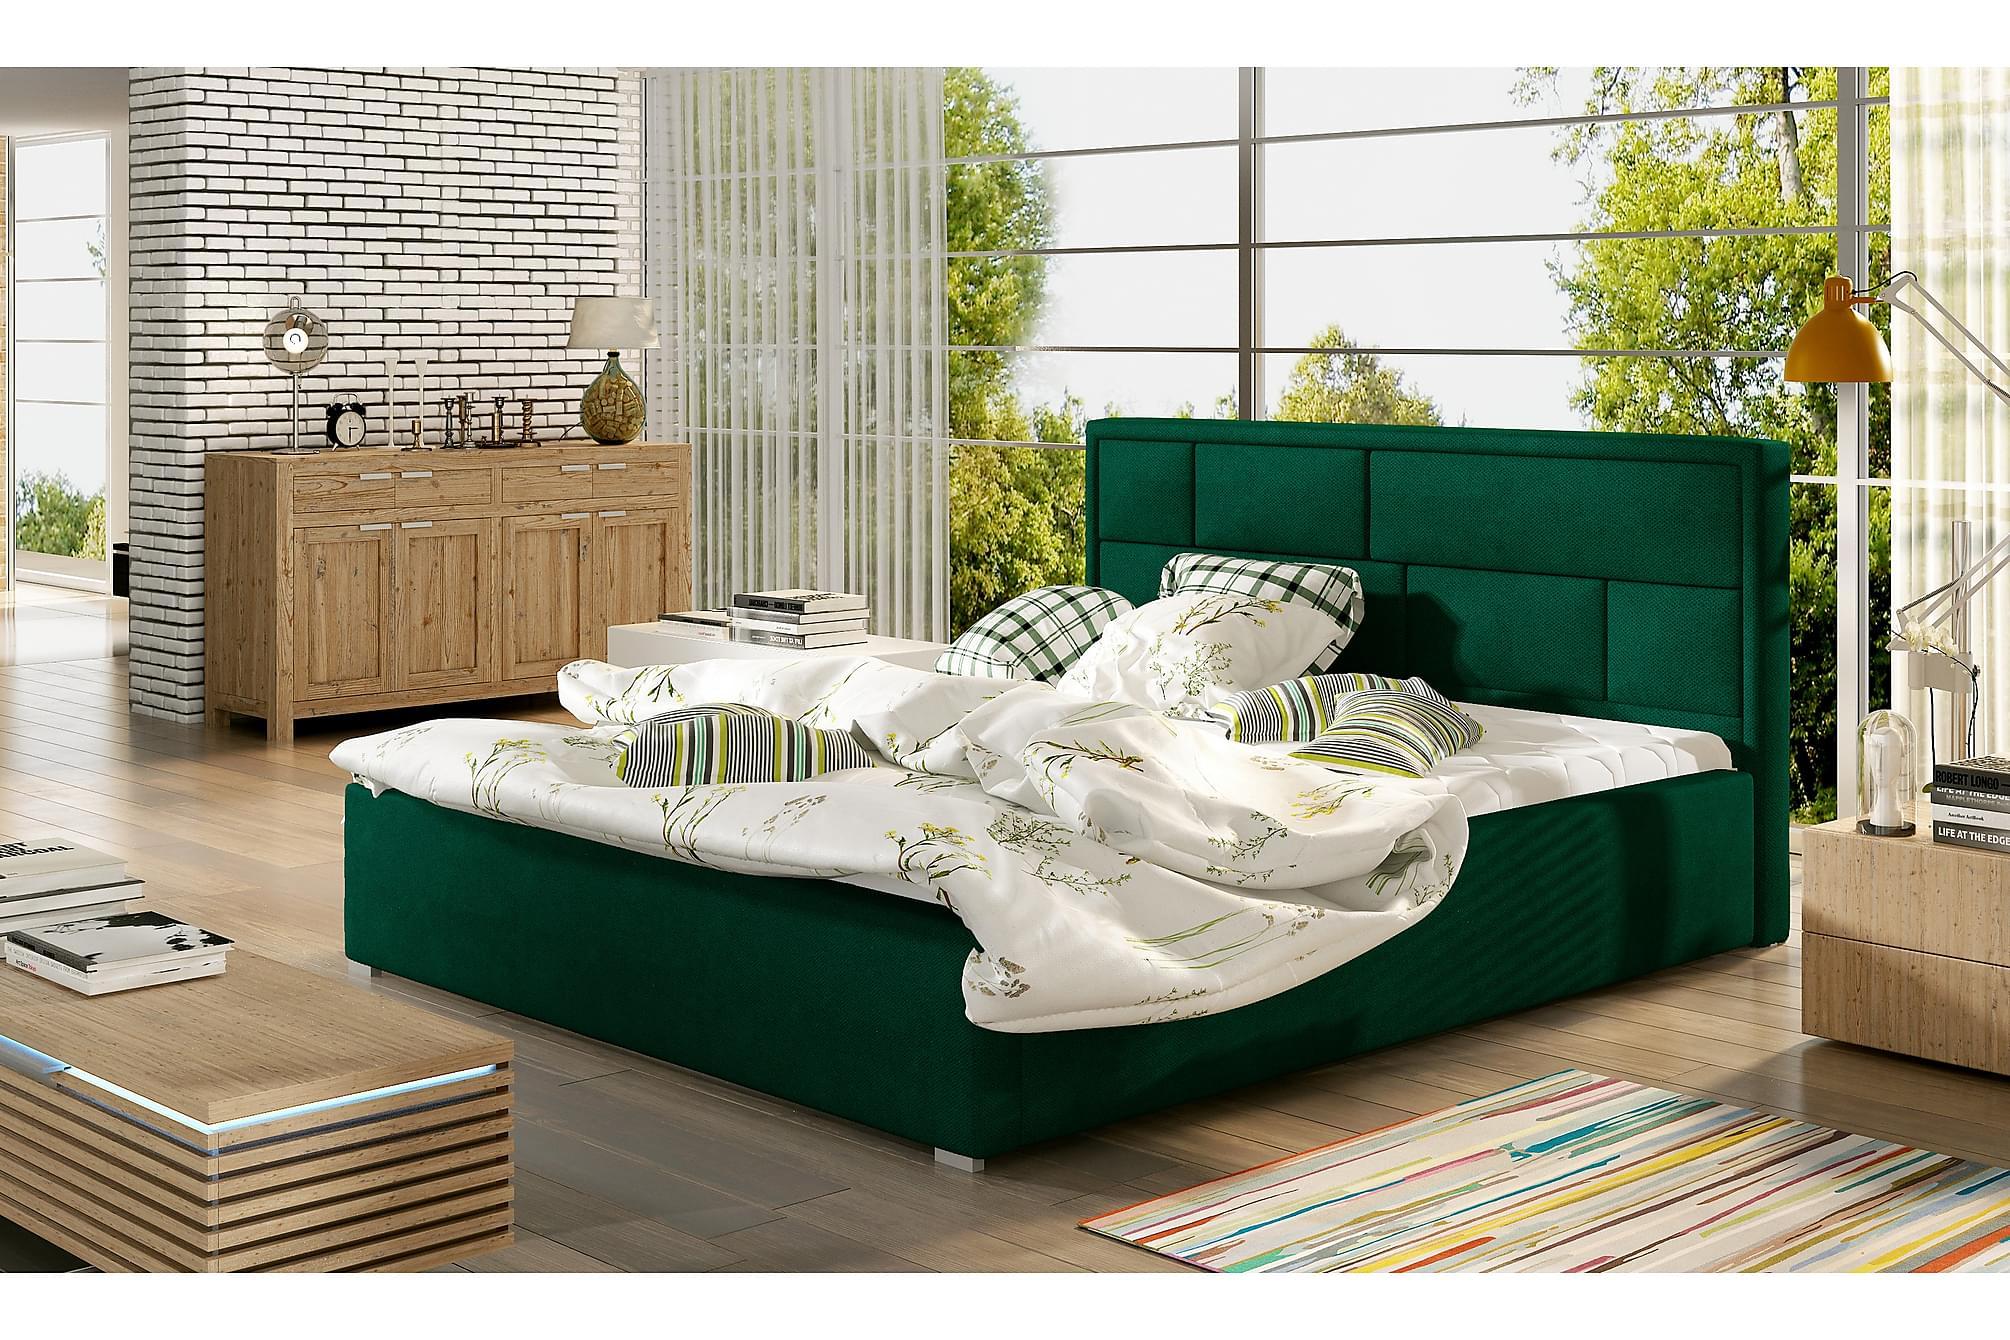 AGULLANA Sängram 160x200 cm Grön, Sängram & sängstomme